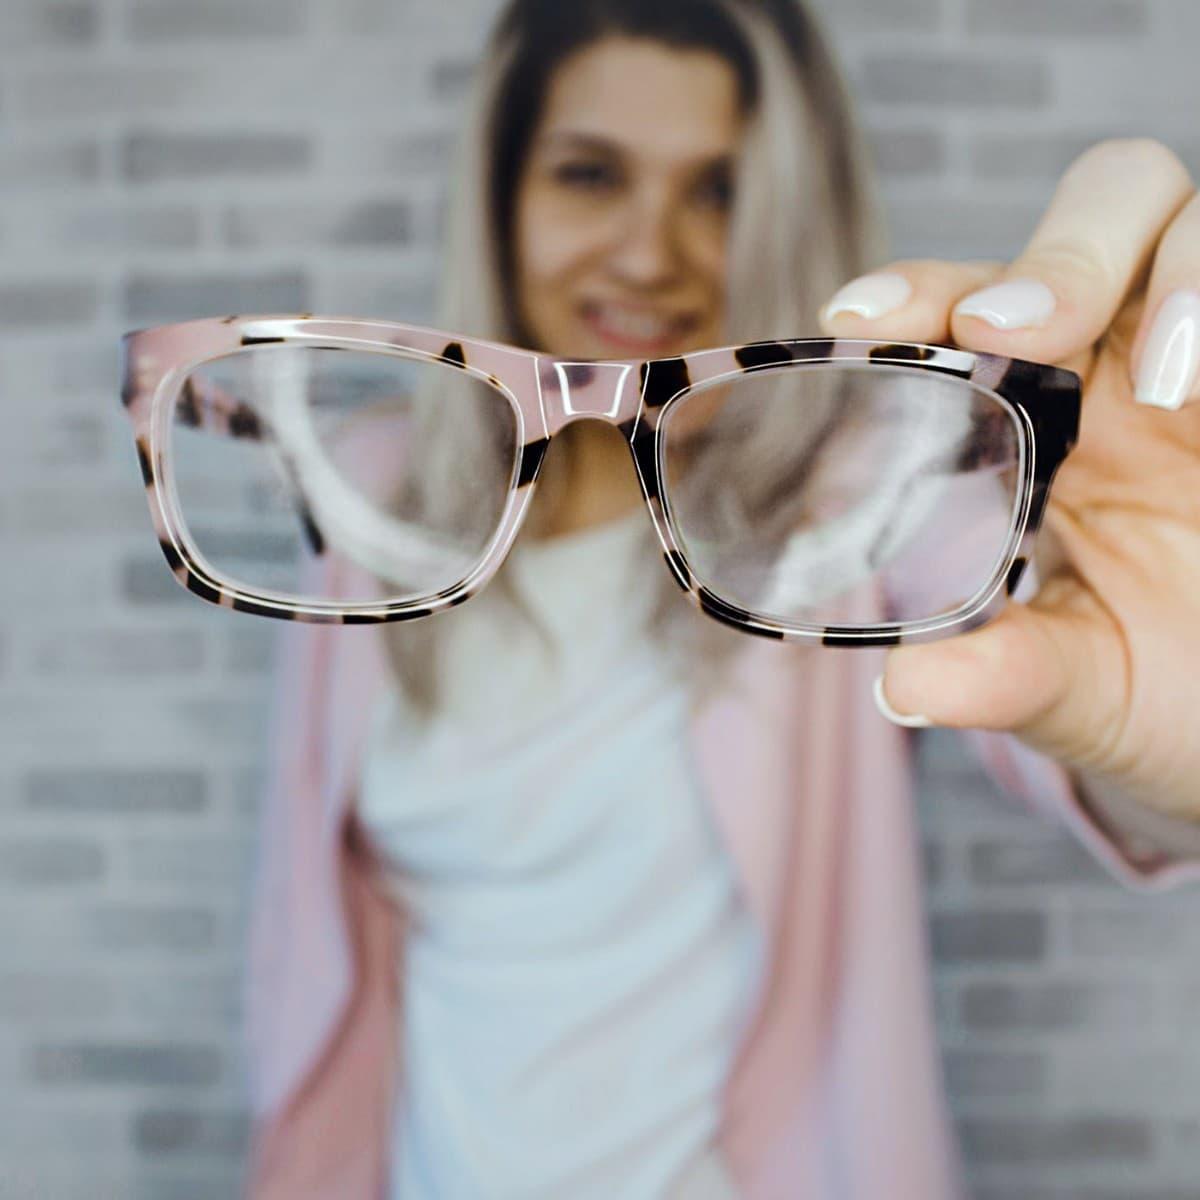 Prayer for good eyesight - Overcoming Myopia and Hypermetropia